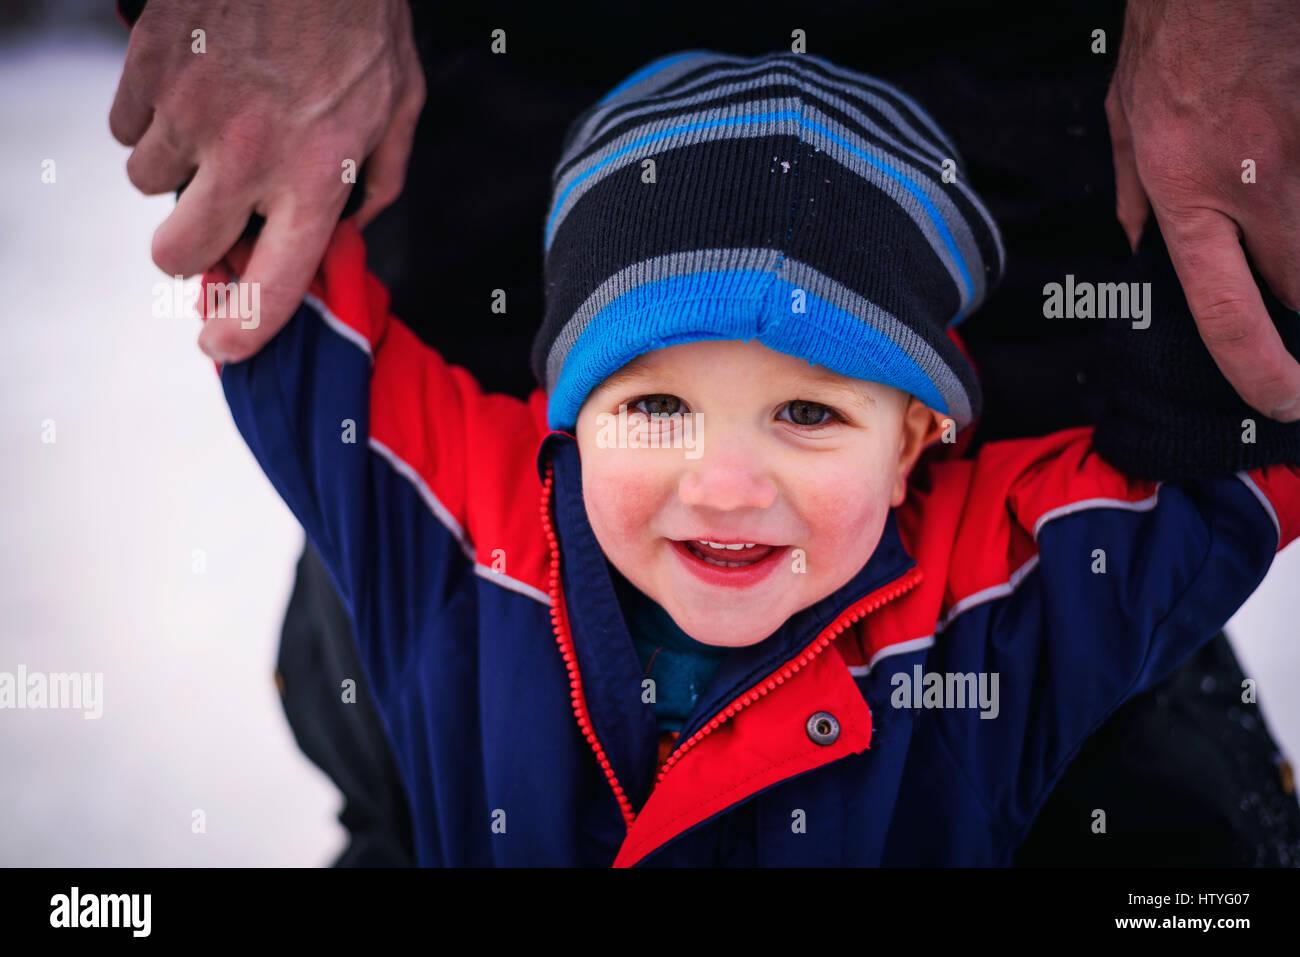 Père tenant son bras tout-petits Photo Stock